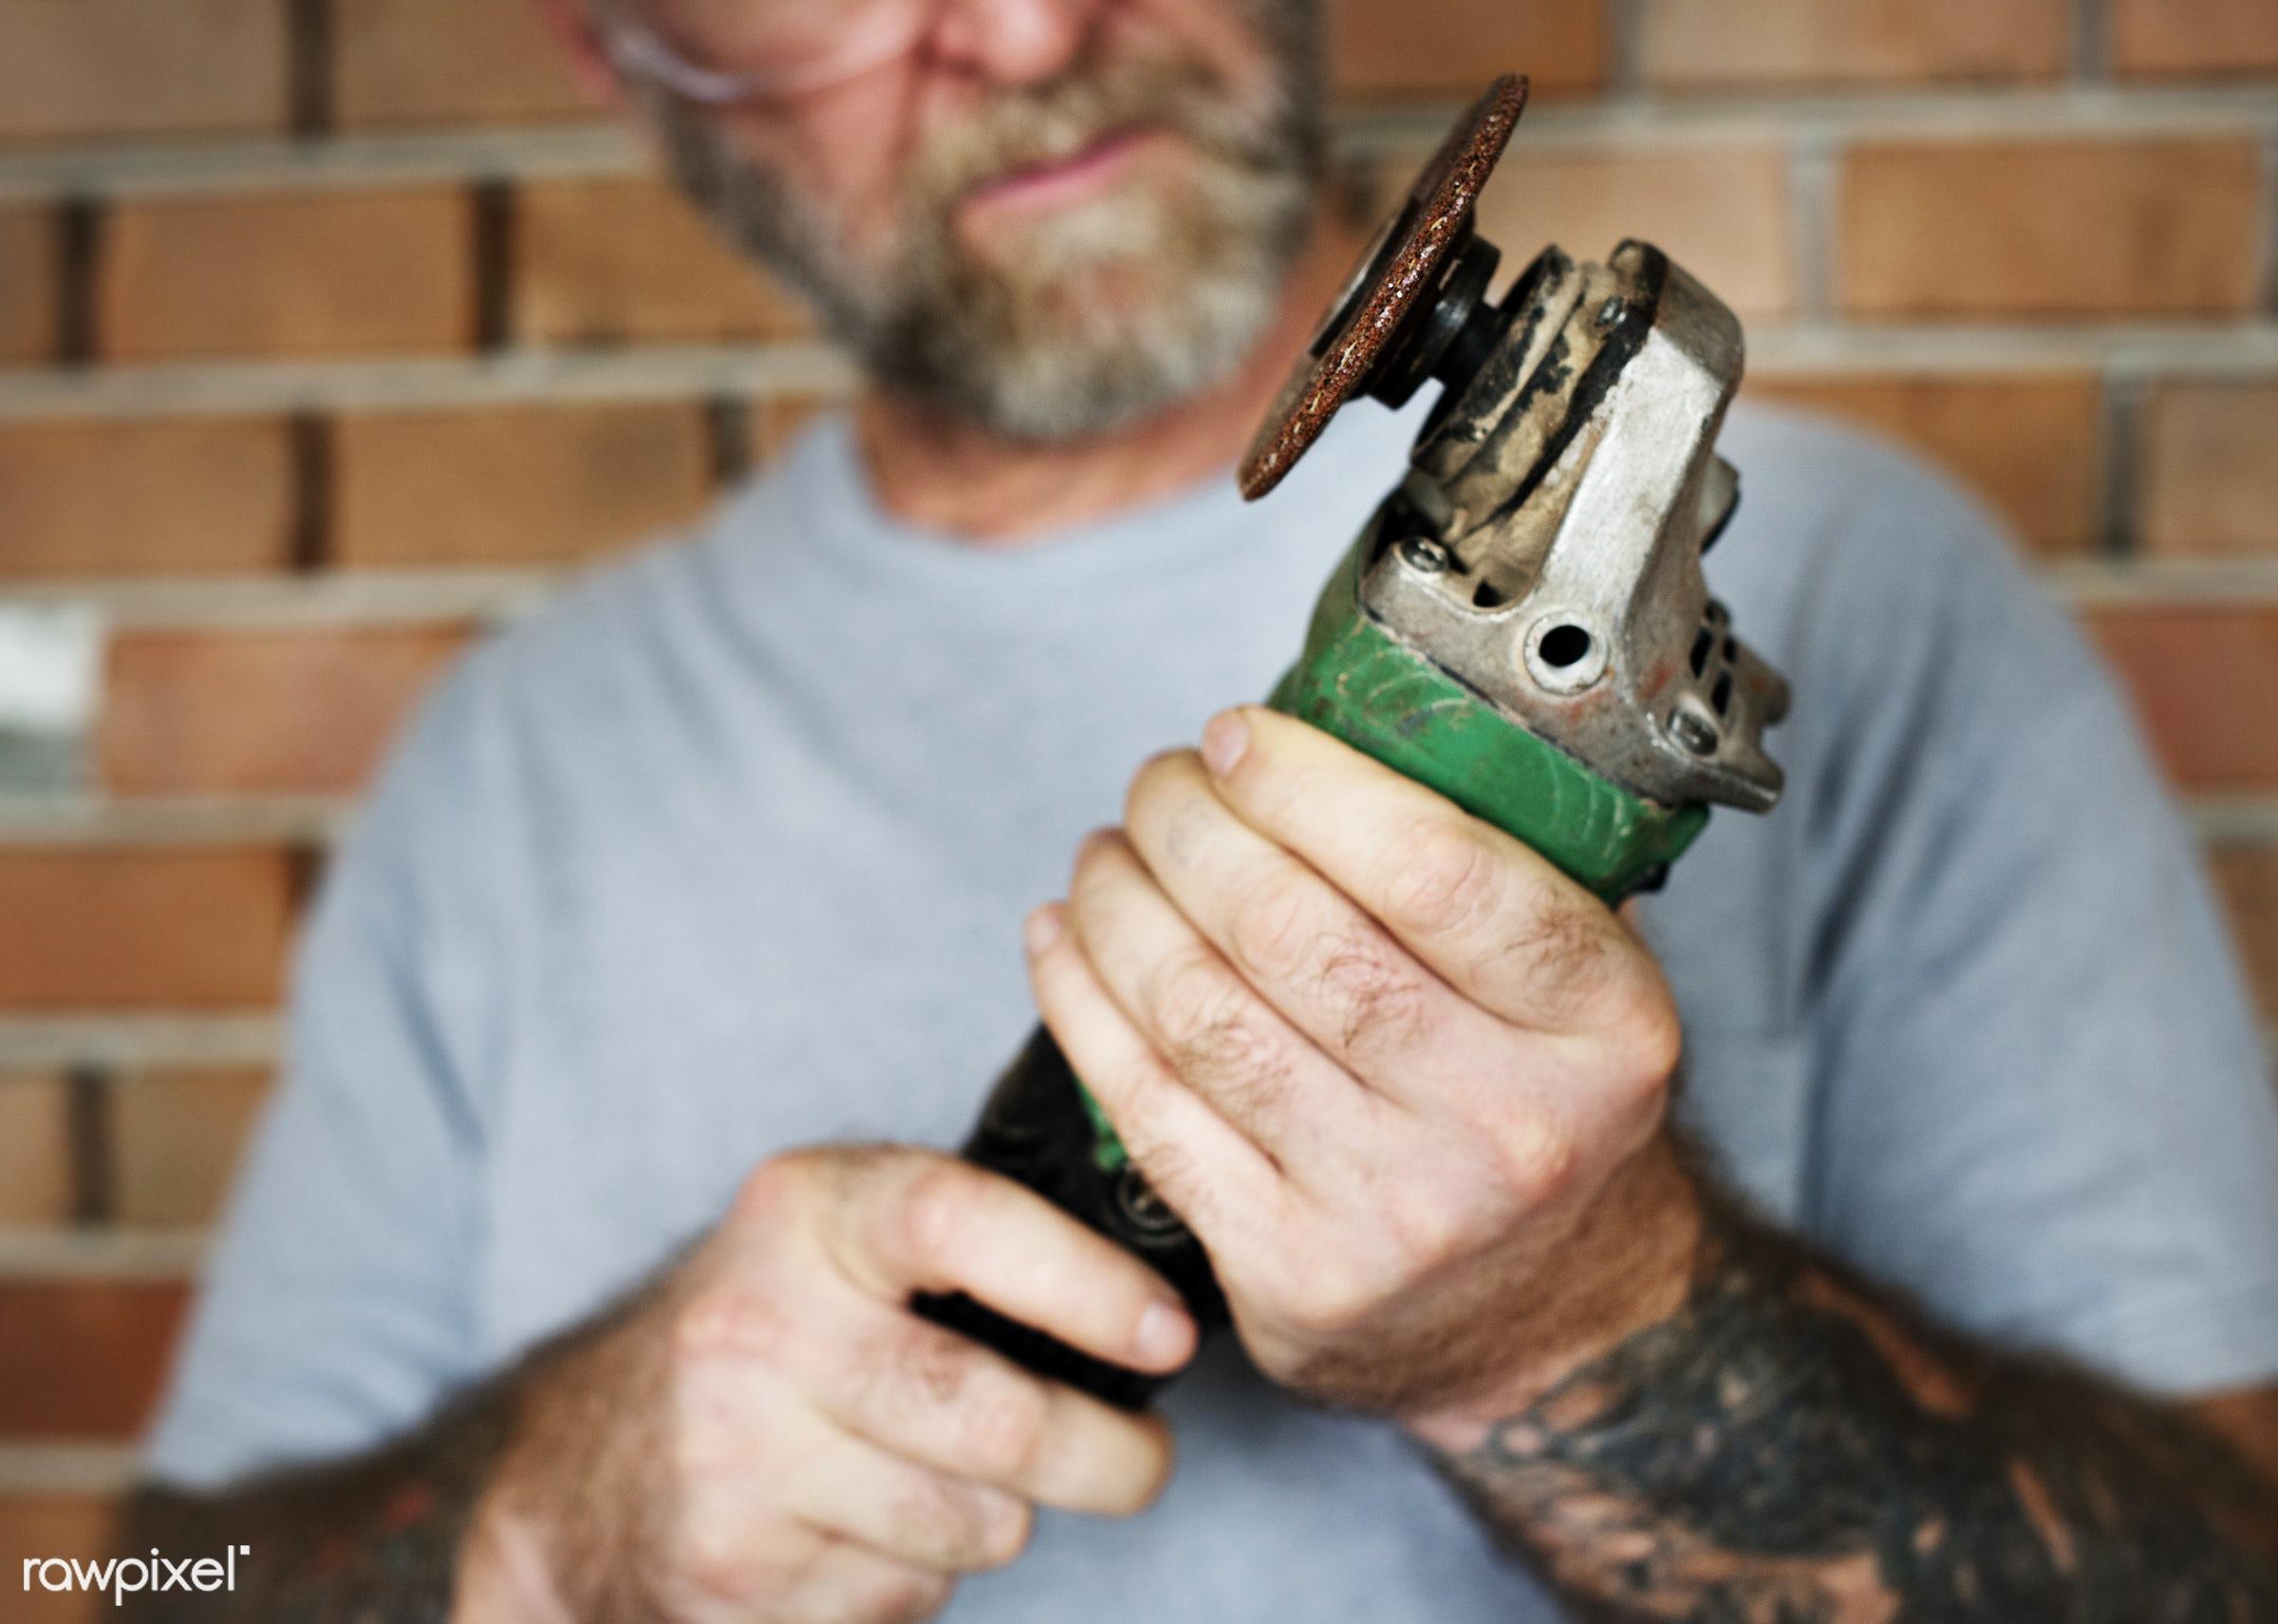 handyman, activity, carpenter, carpentry, construction, craft, craftsman, design, diy, equipment, eyeglasses, handmade,...